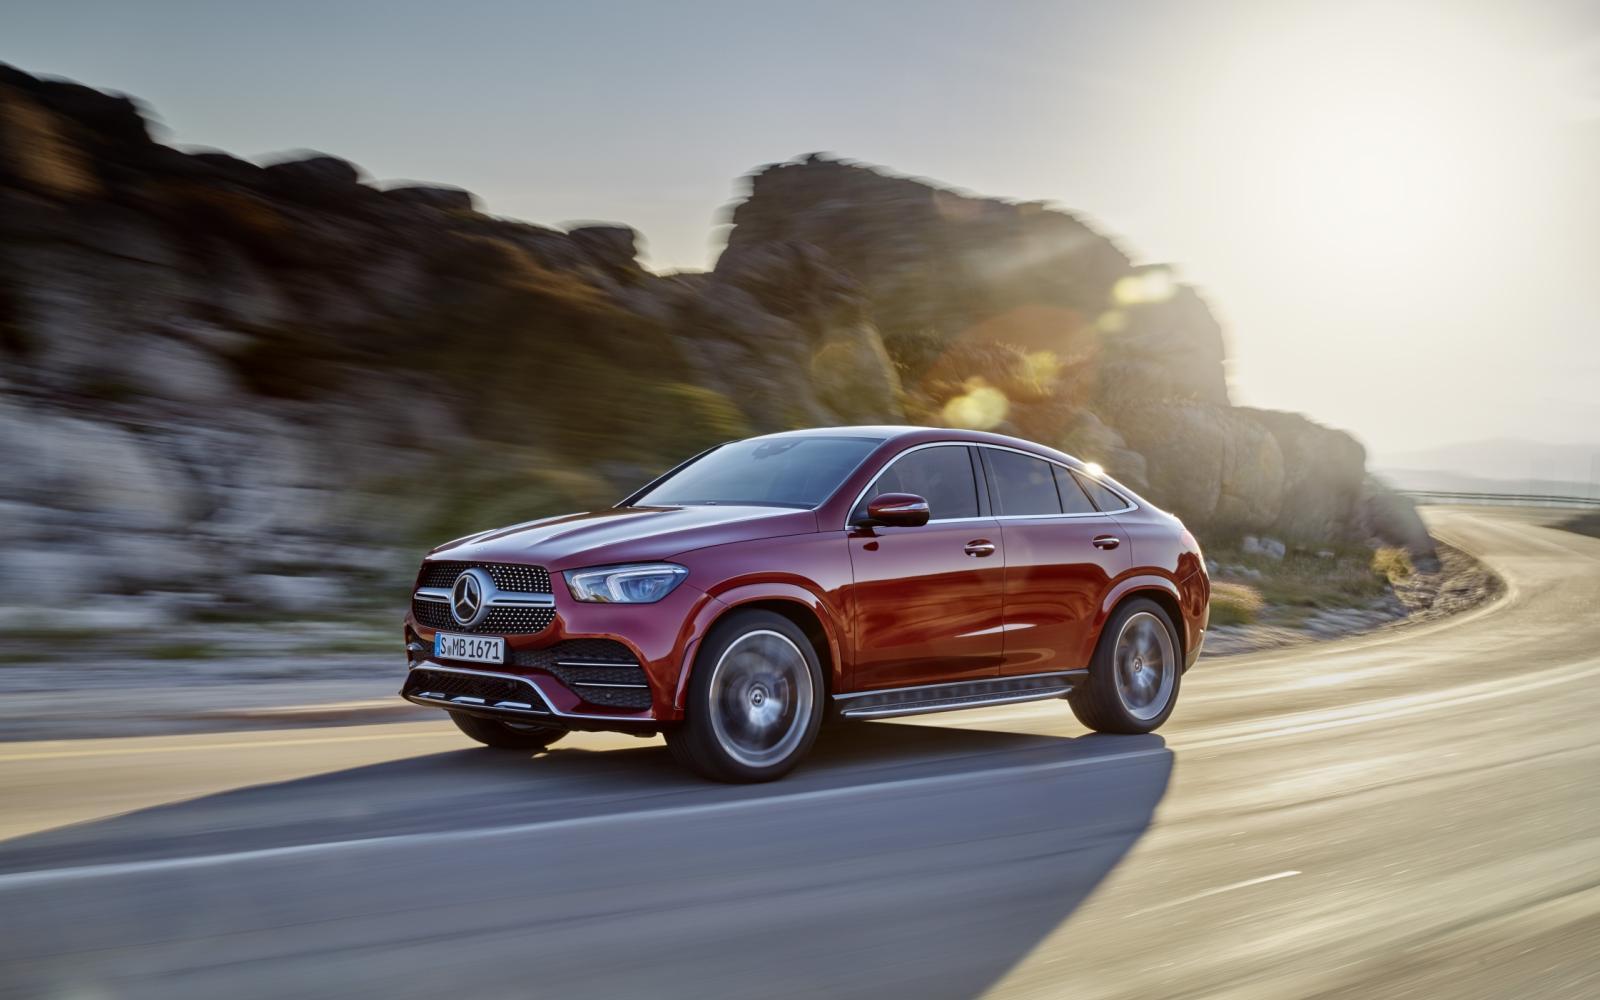 Mercedes Gle Coupe 2019 Gaat Bmw X6 Te Lijf Autowereld Com